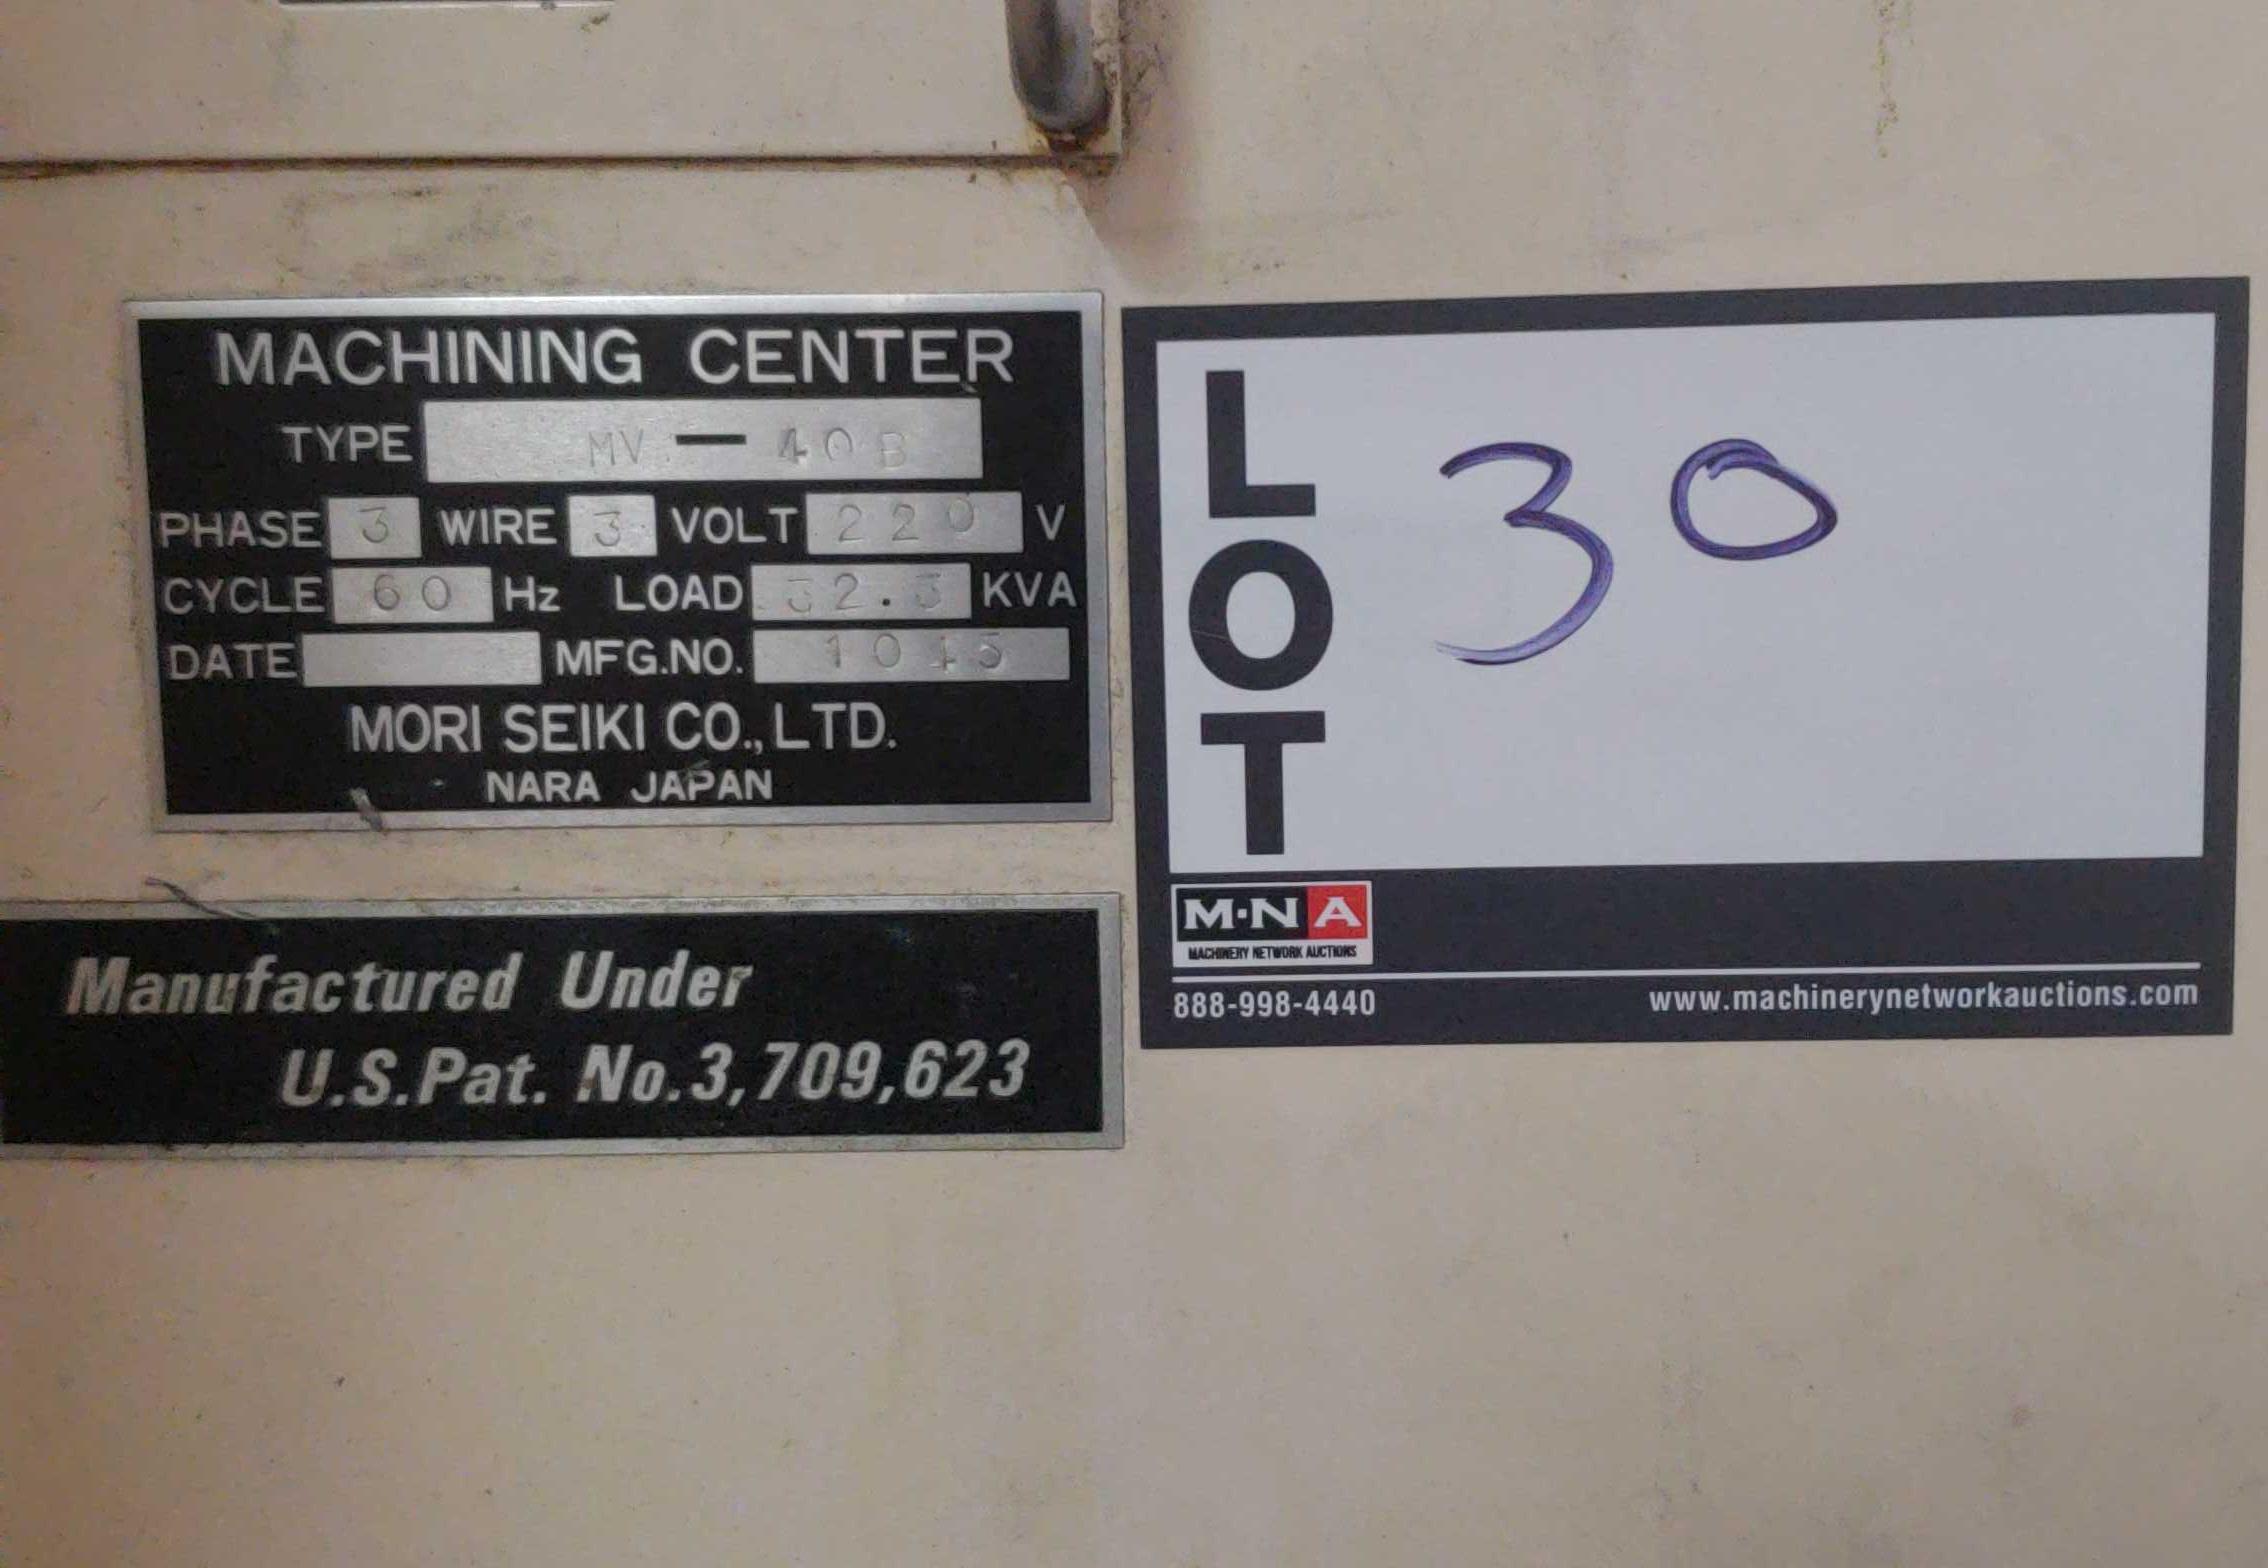 "Mori Seiki MV 40B CNC Mill, Fanuc 11M control w/ LCD screen CAT 40 spindle, 20 POS ATC, 31.5""x X - Image 6 of 6"